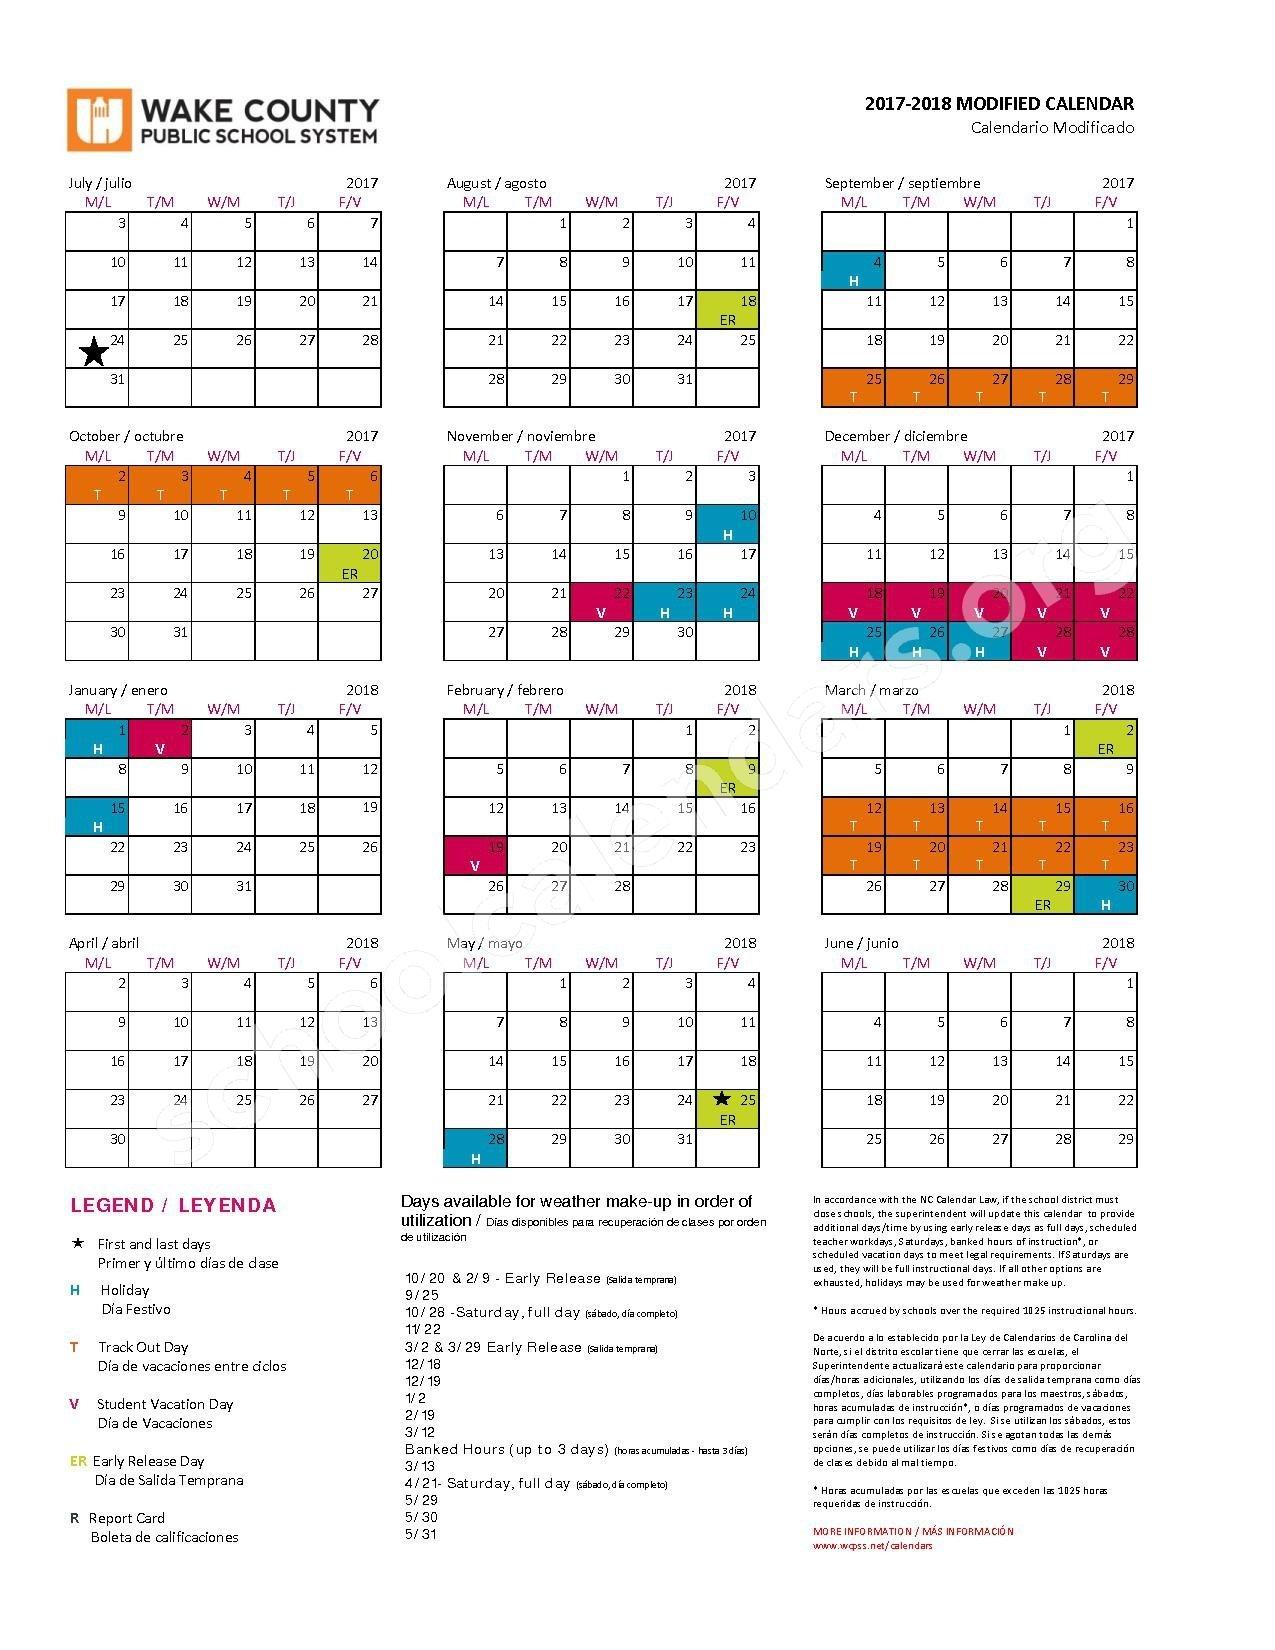 Wake County School Calendar 2020 | Free Printable Calendar Intended For Wake County Schools Calendar